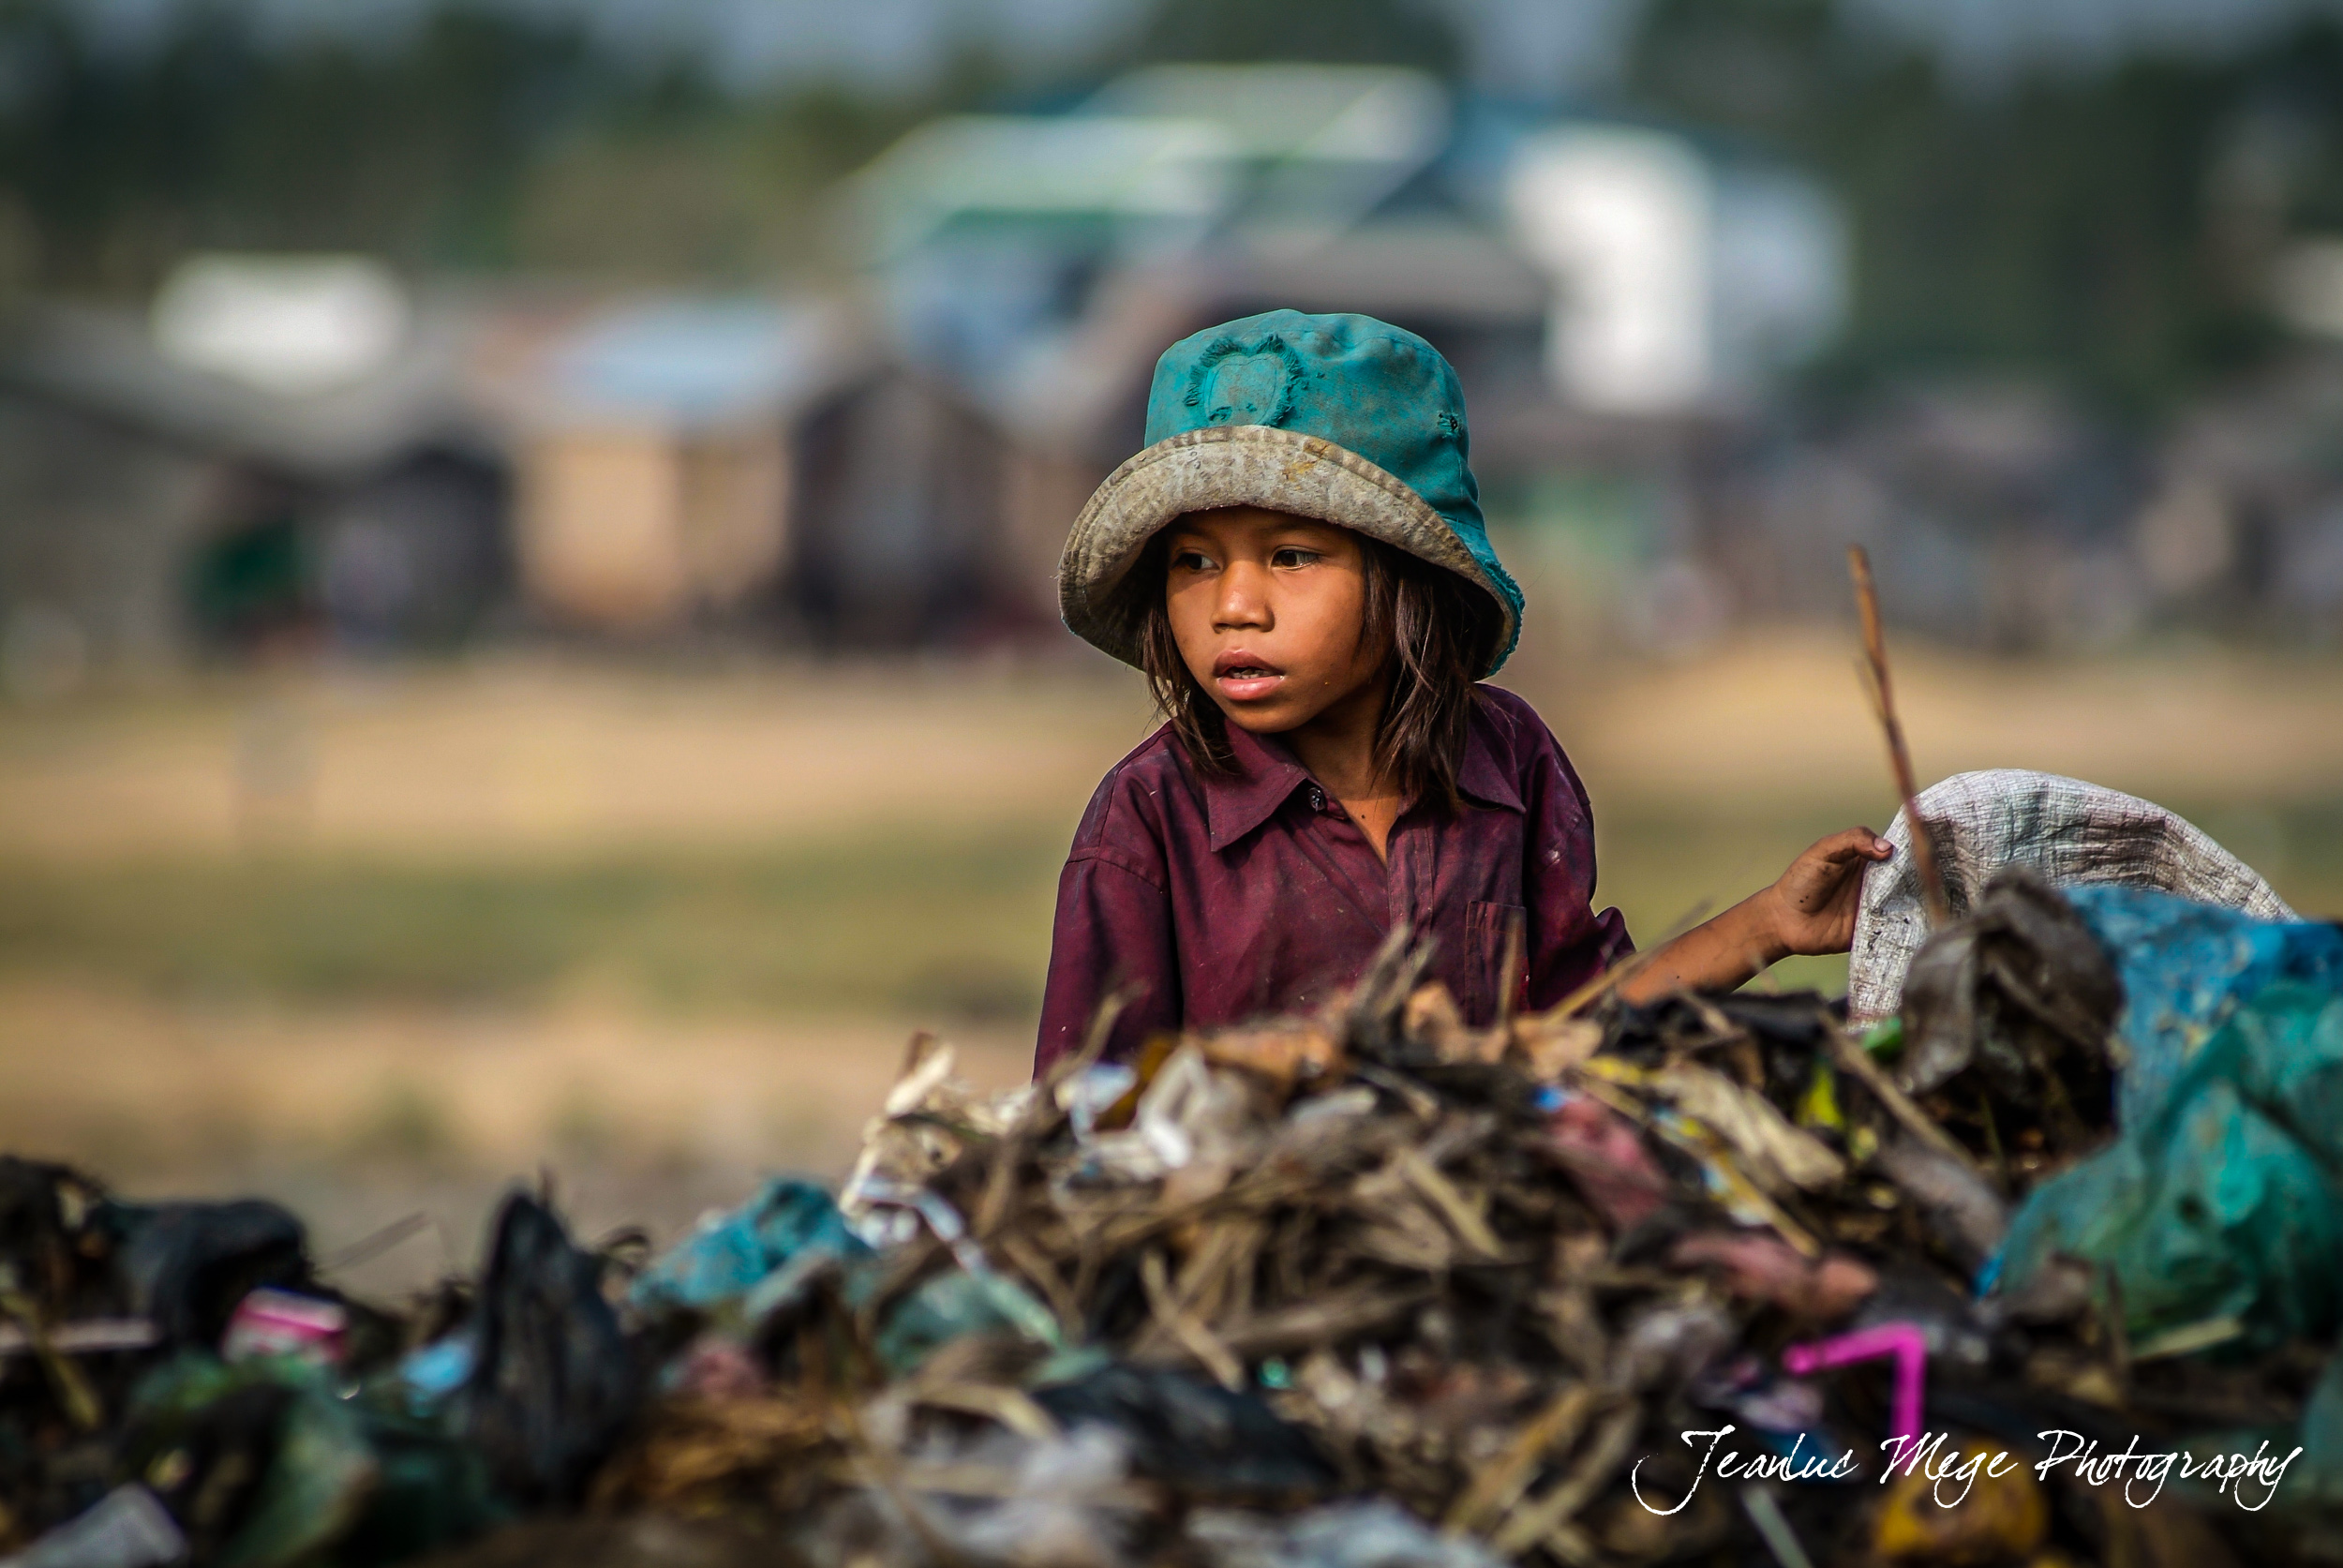 Jean Luc Mege Cambodia-8613.jpg